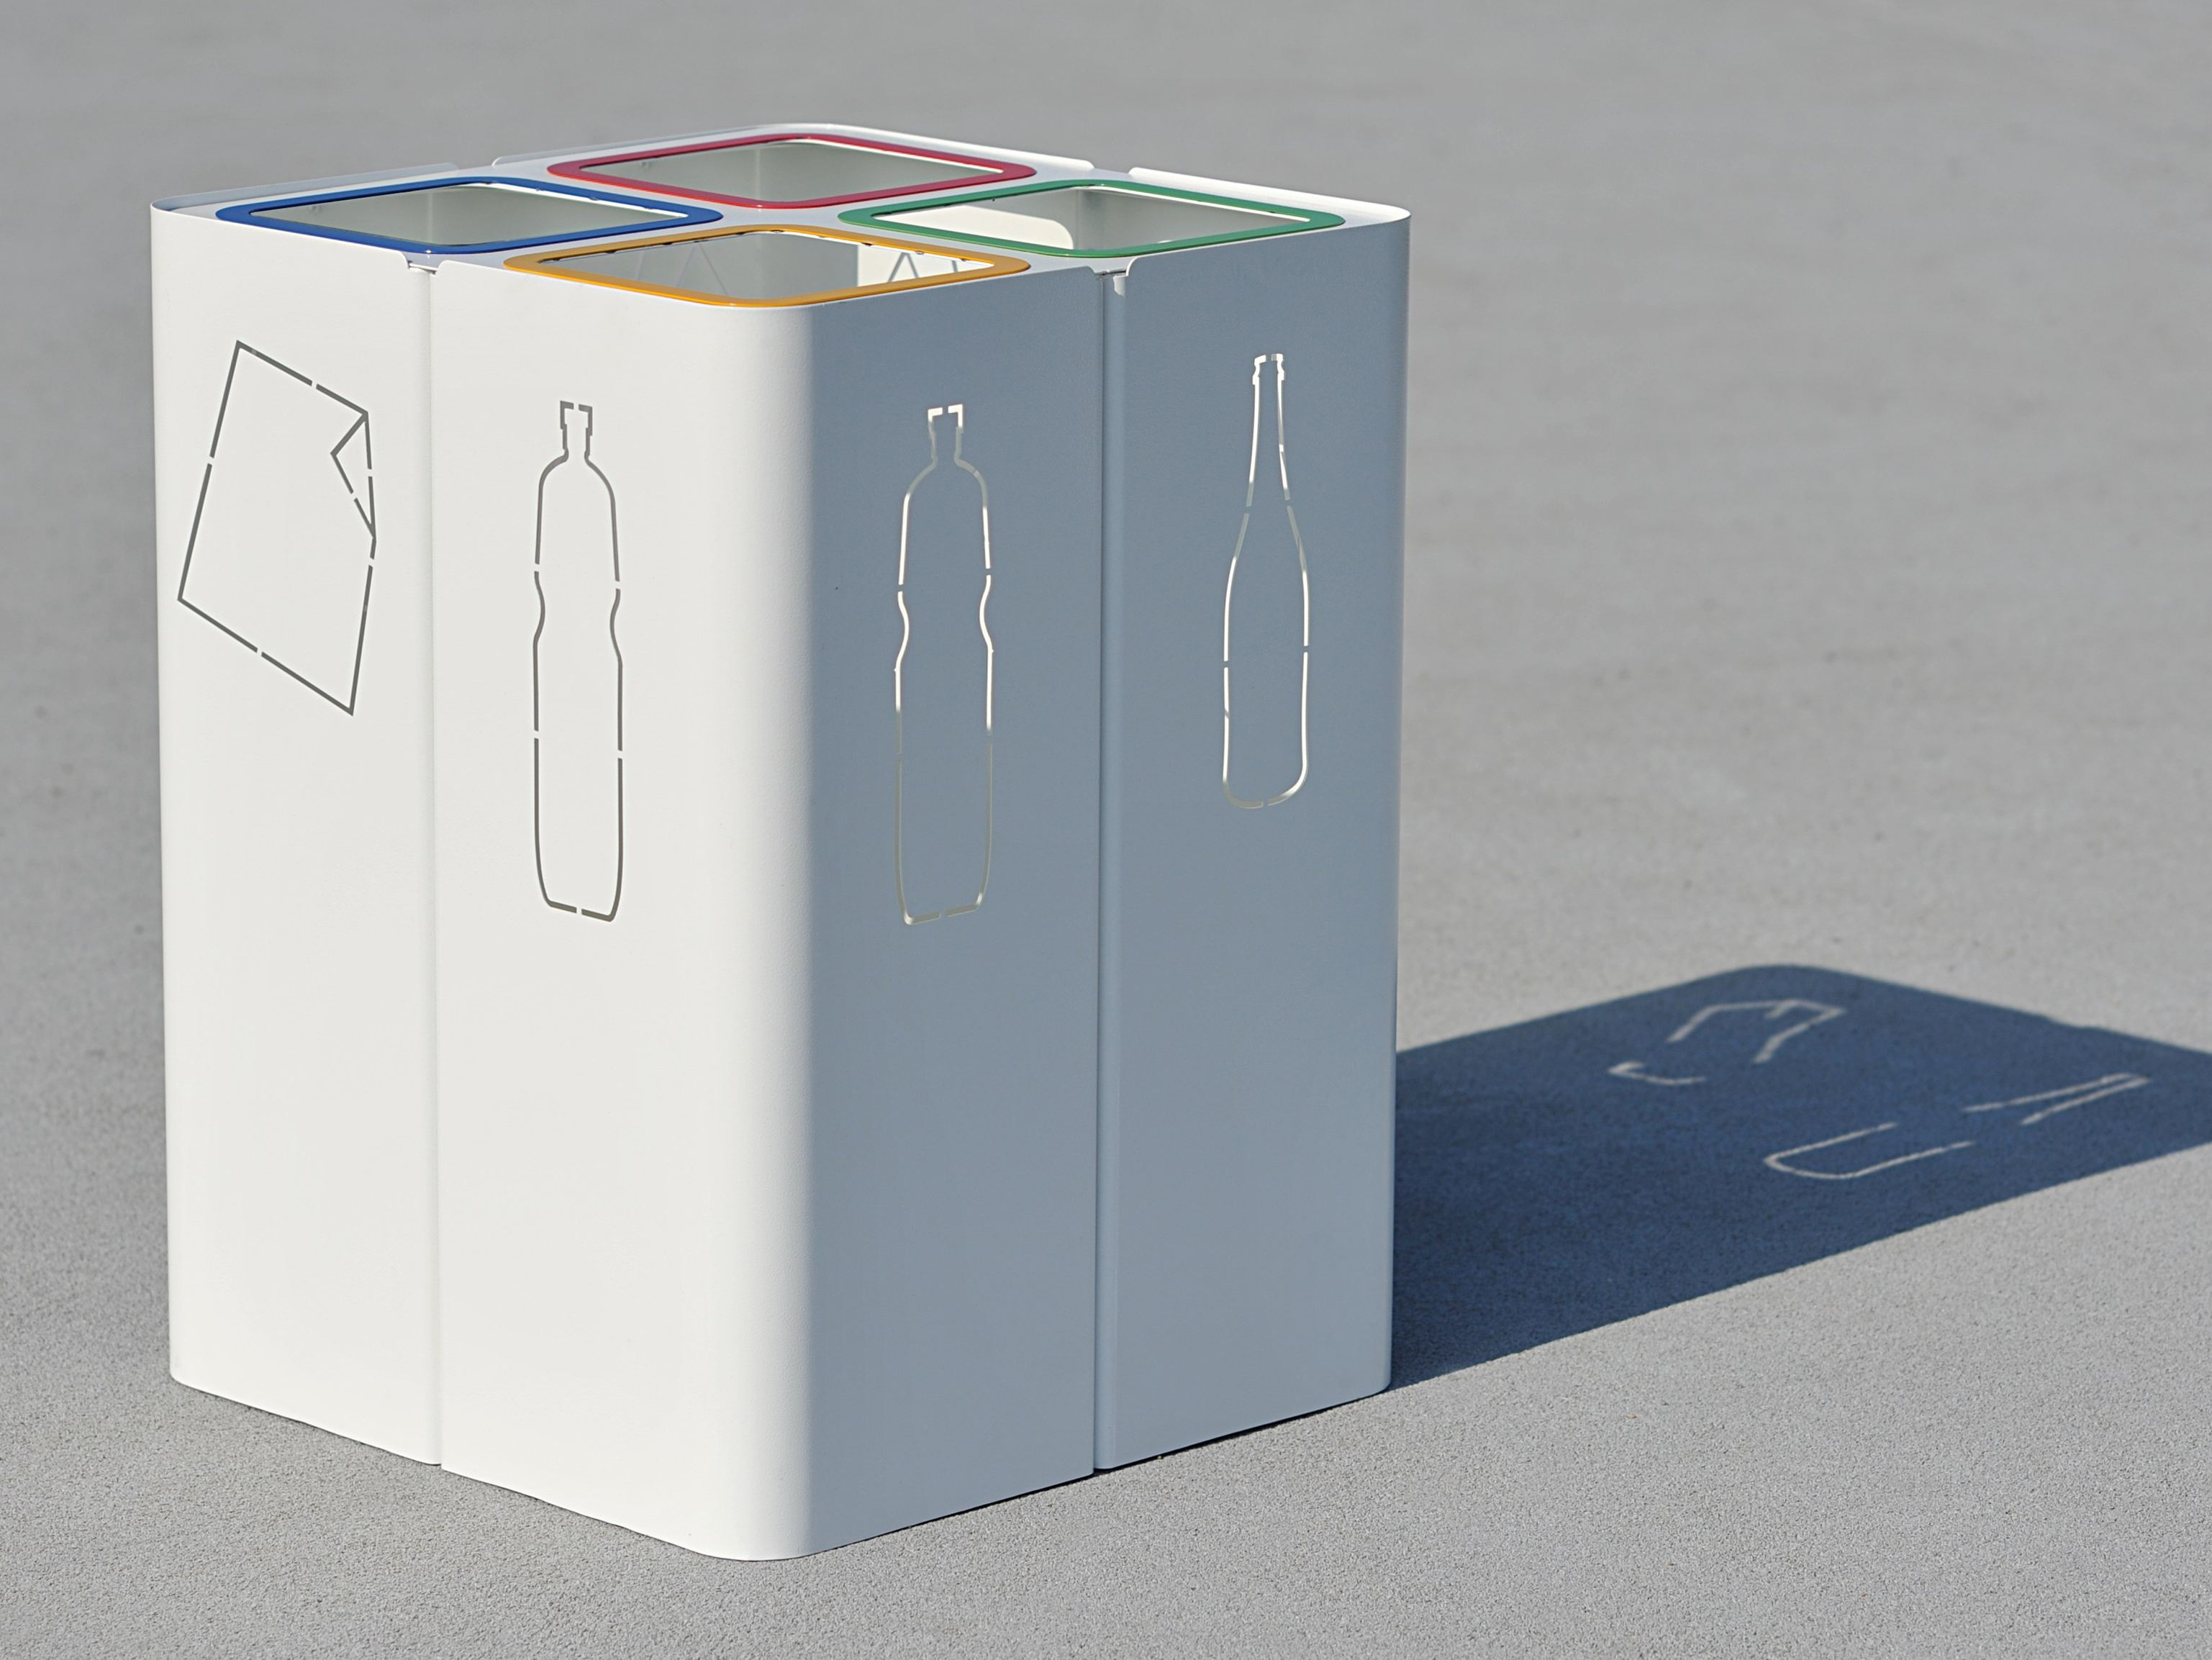 Portarifiuti in acciaio per raccolta differenziata Create a blueprint